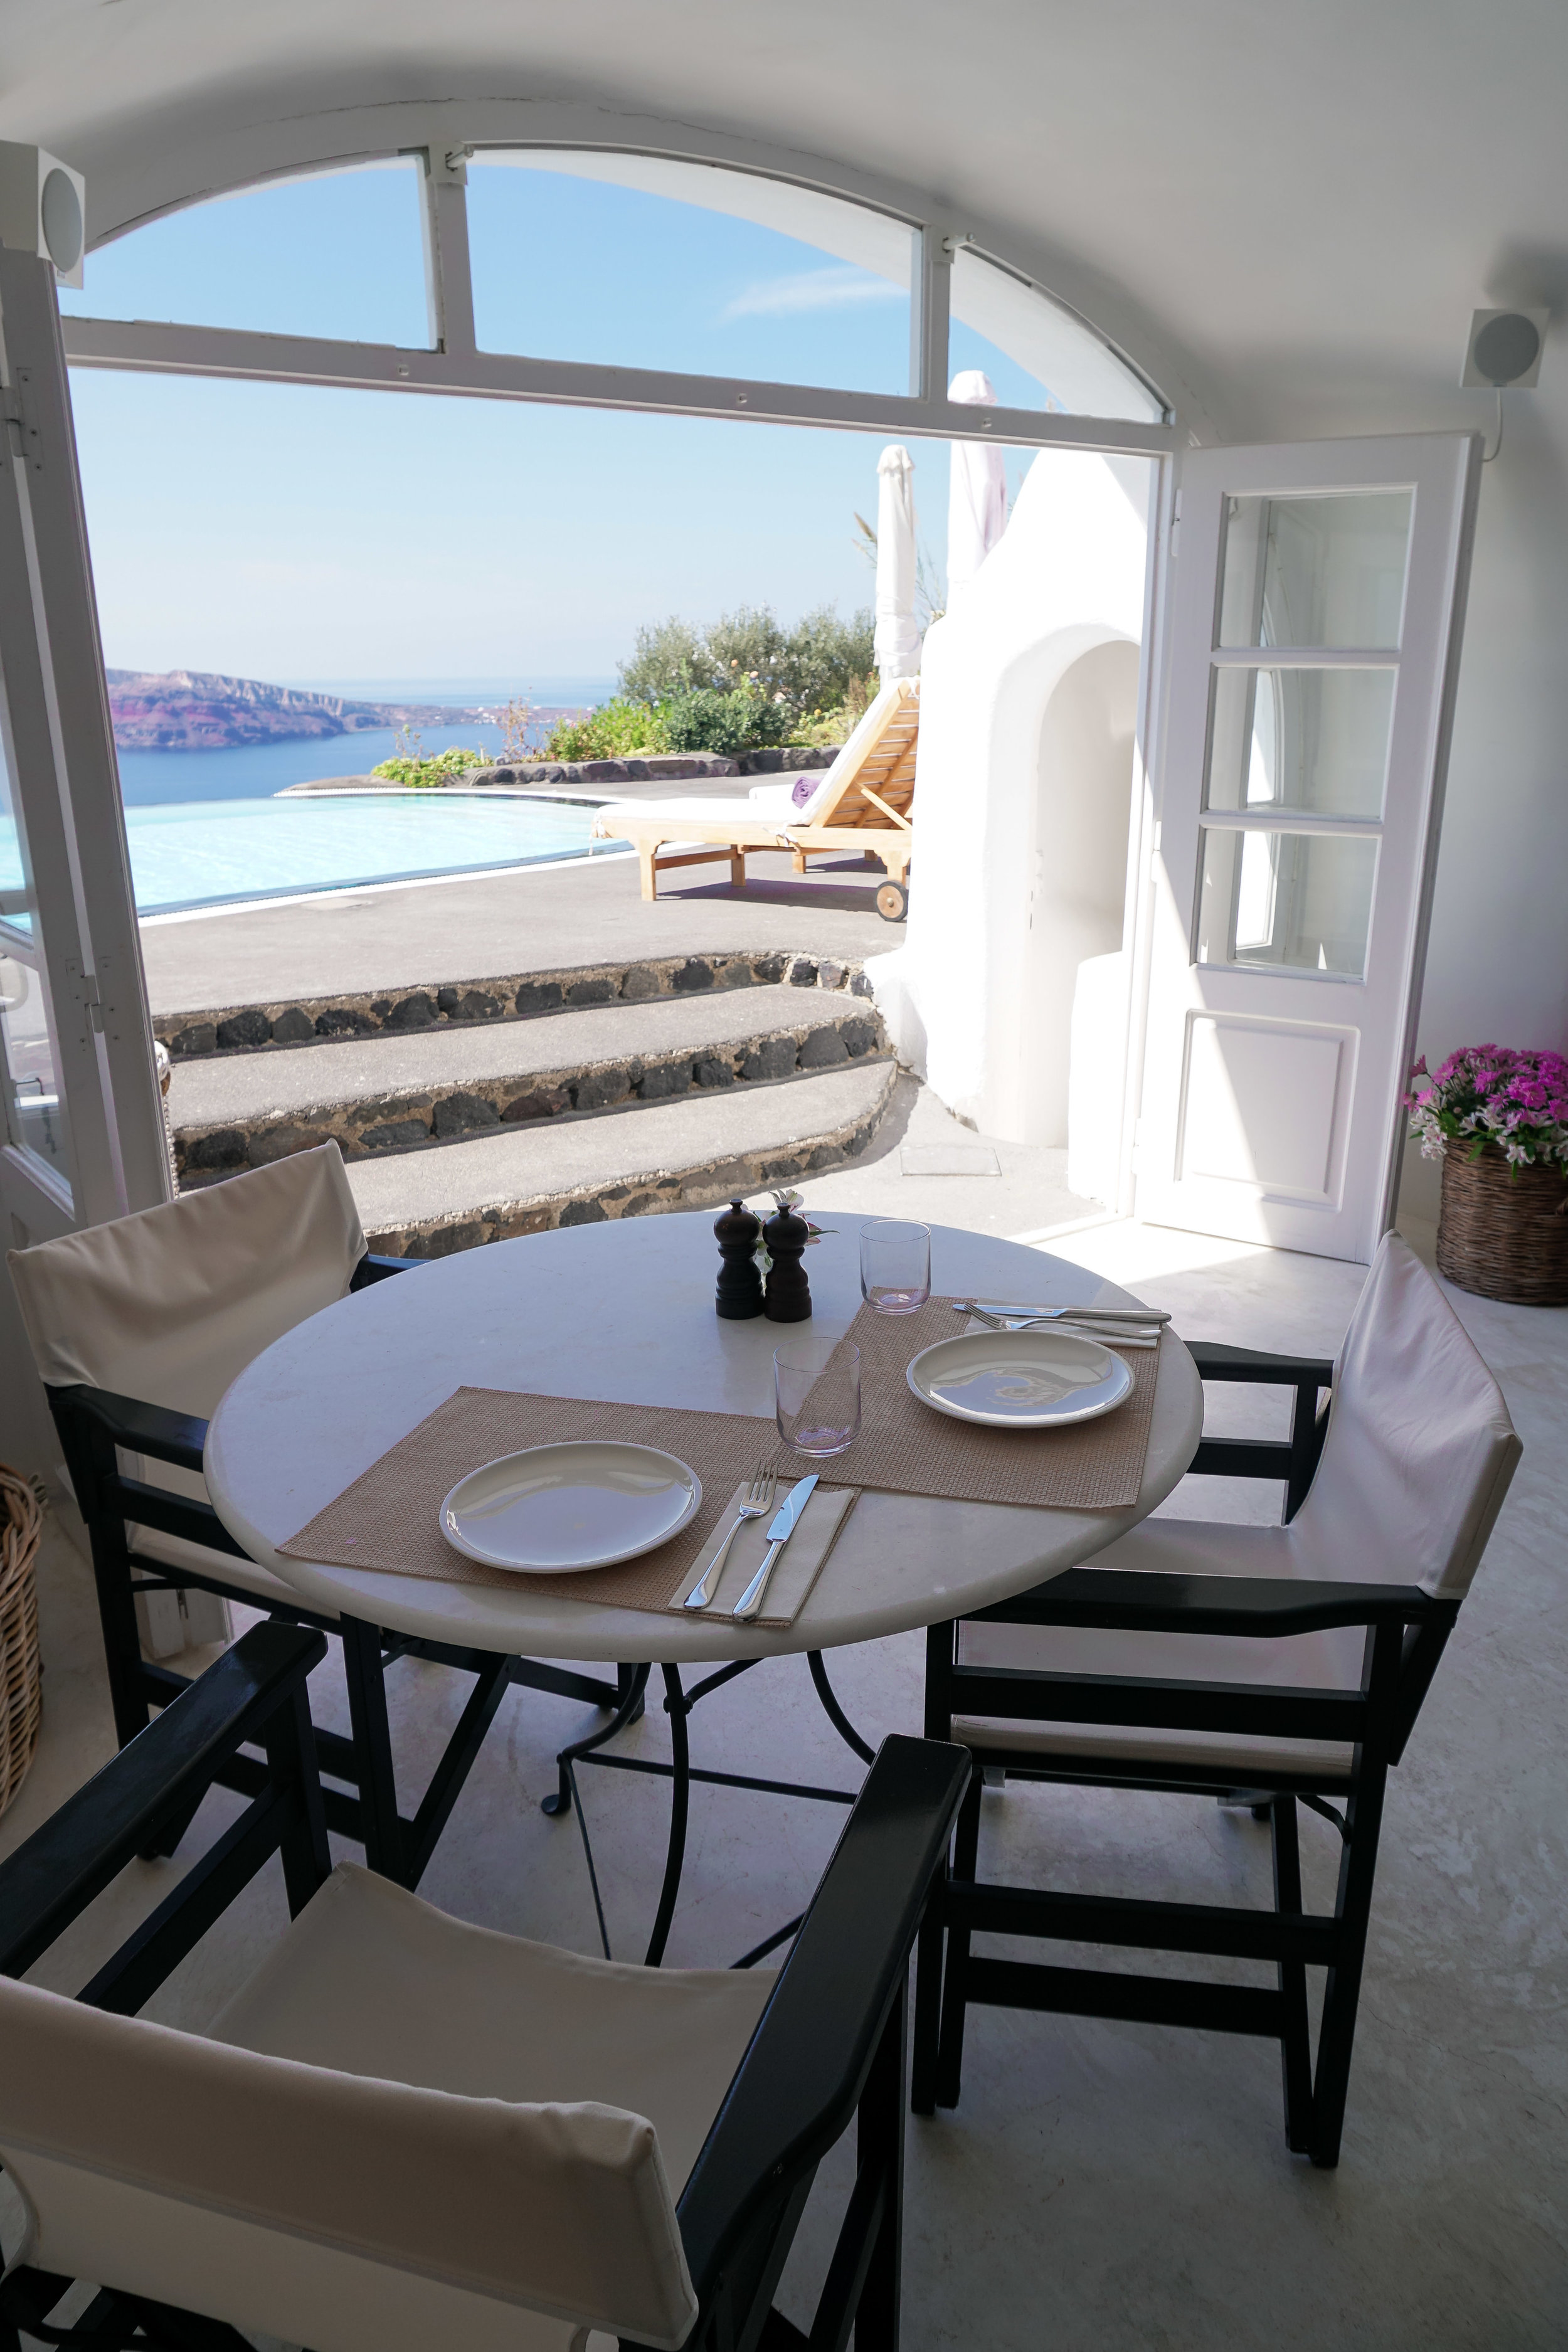 curio.trips.greece.santorini.hotel.restaurant.view.portrait.jpg